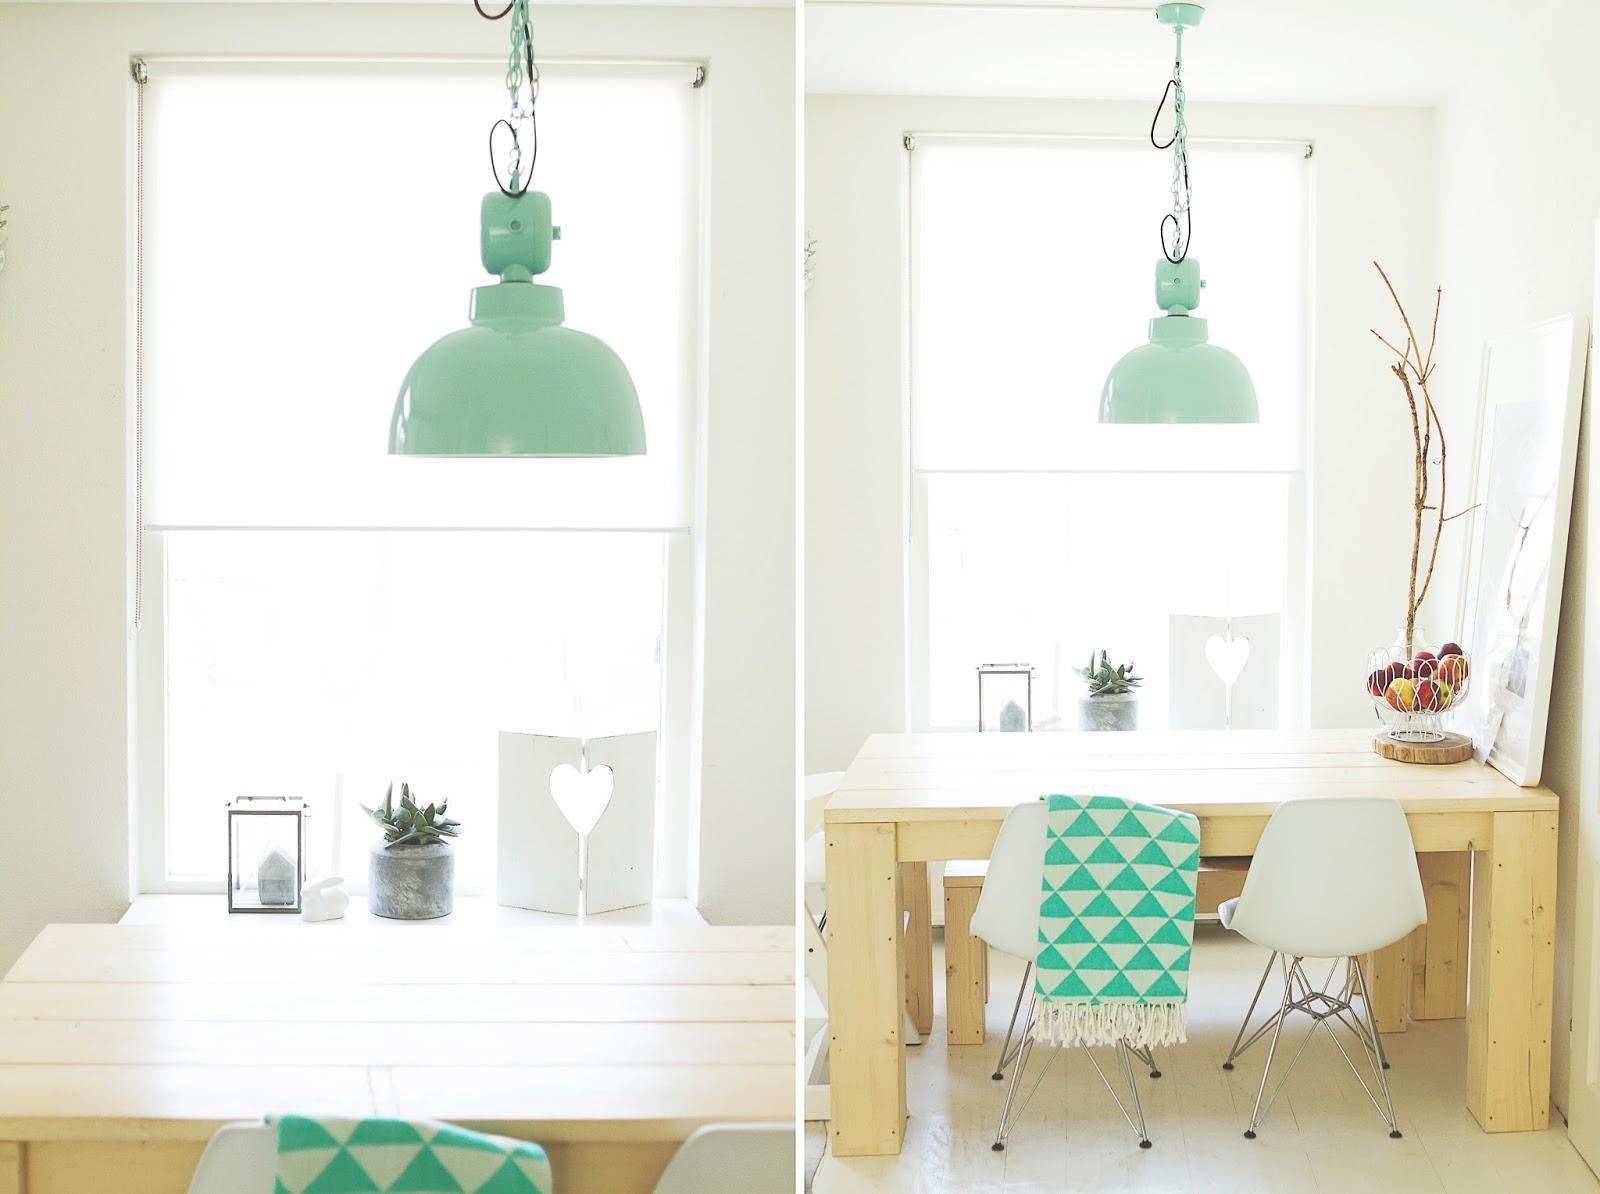 Lamp Babykamer Groen: Babykamer mintgroen grijs tips accessoires en ...